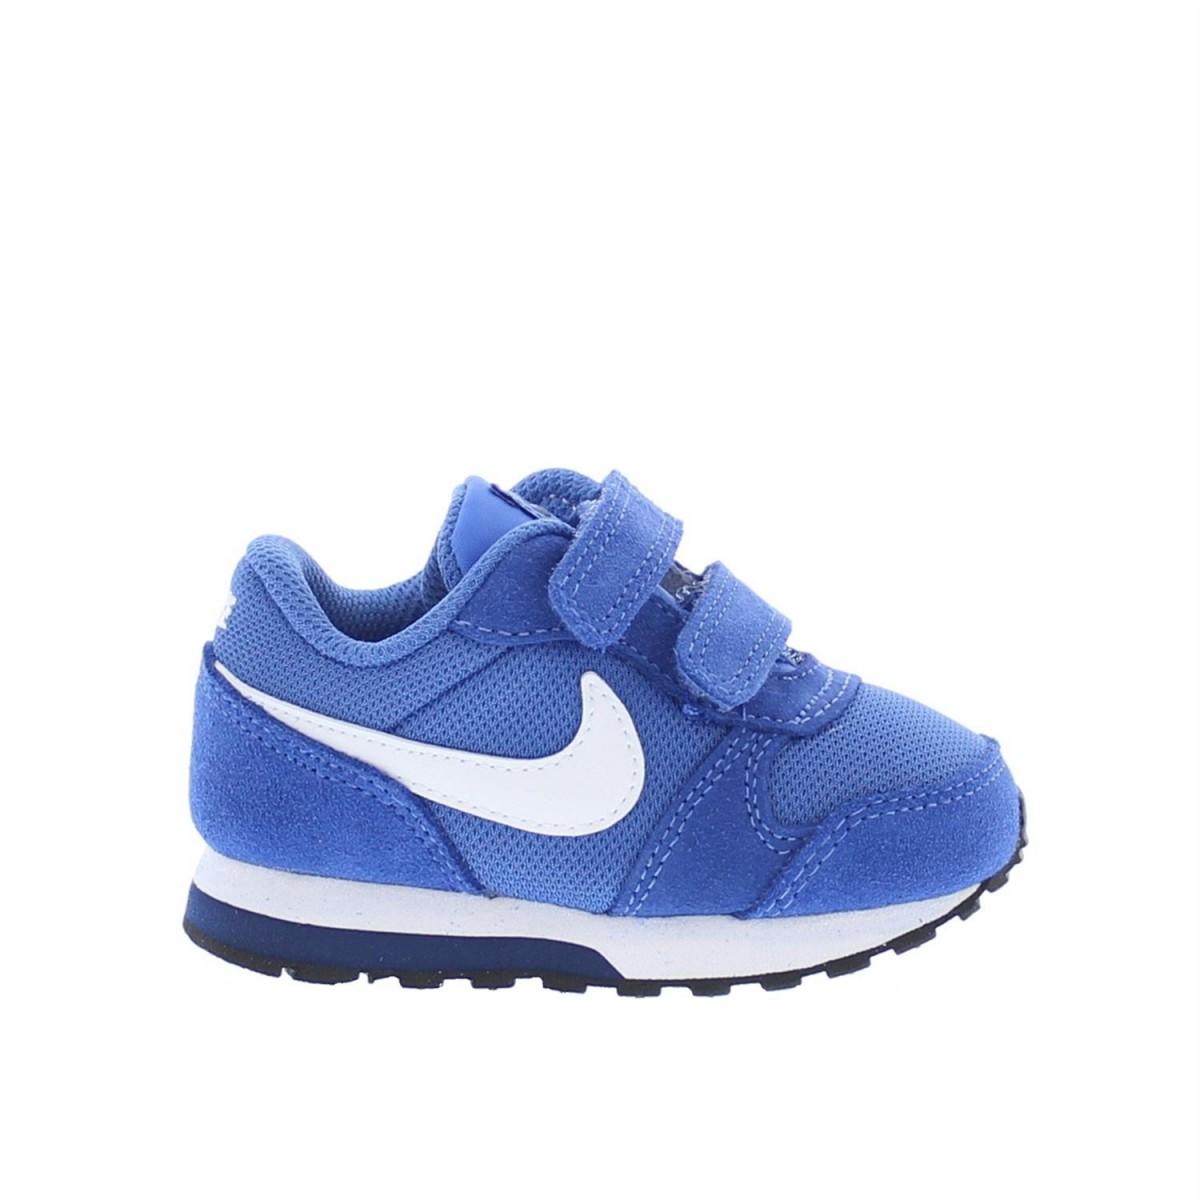 9937a81bc2eb1 Bizz Store - Tênis Infantil Masculino Nike MD Runner Azul